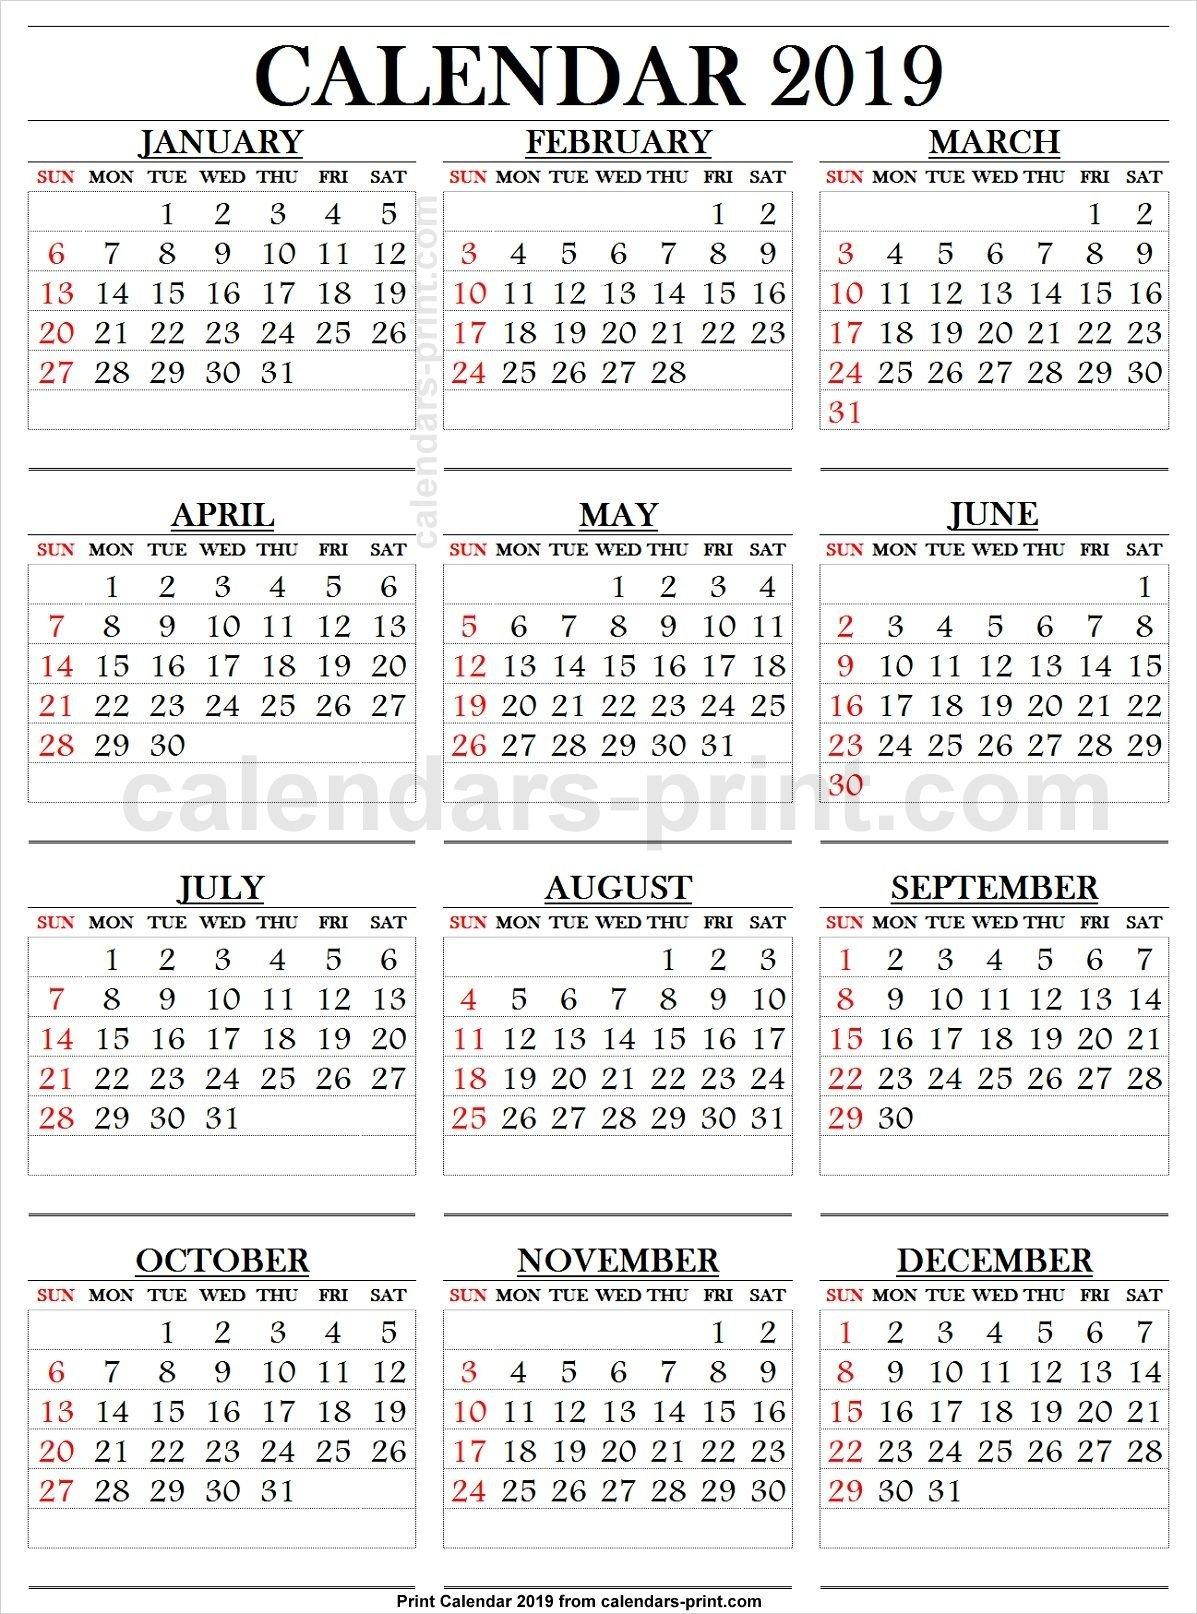 2019 Calendar Large Numbers | 2019 Yearly Calendar | 2019 Calendar Calendar 2019 Large Printable